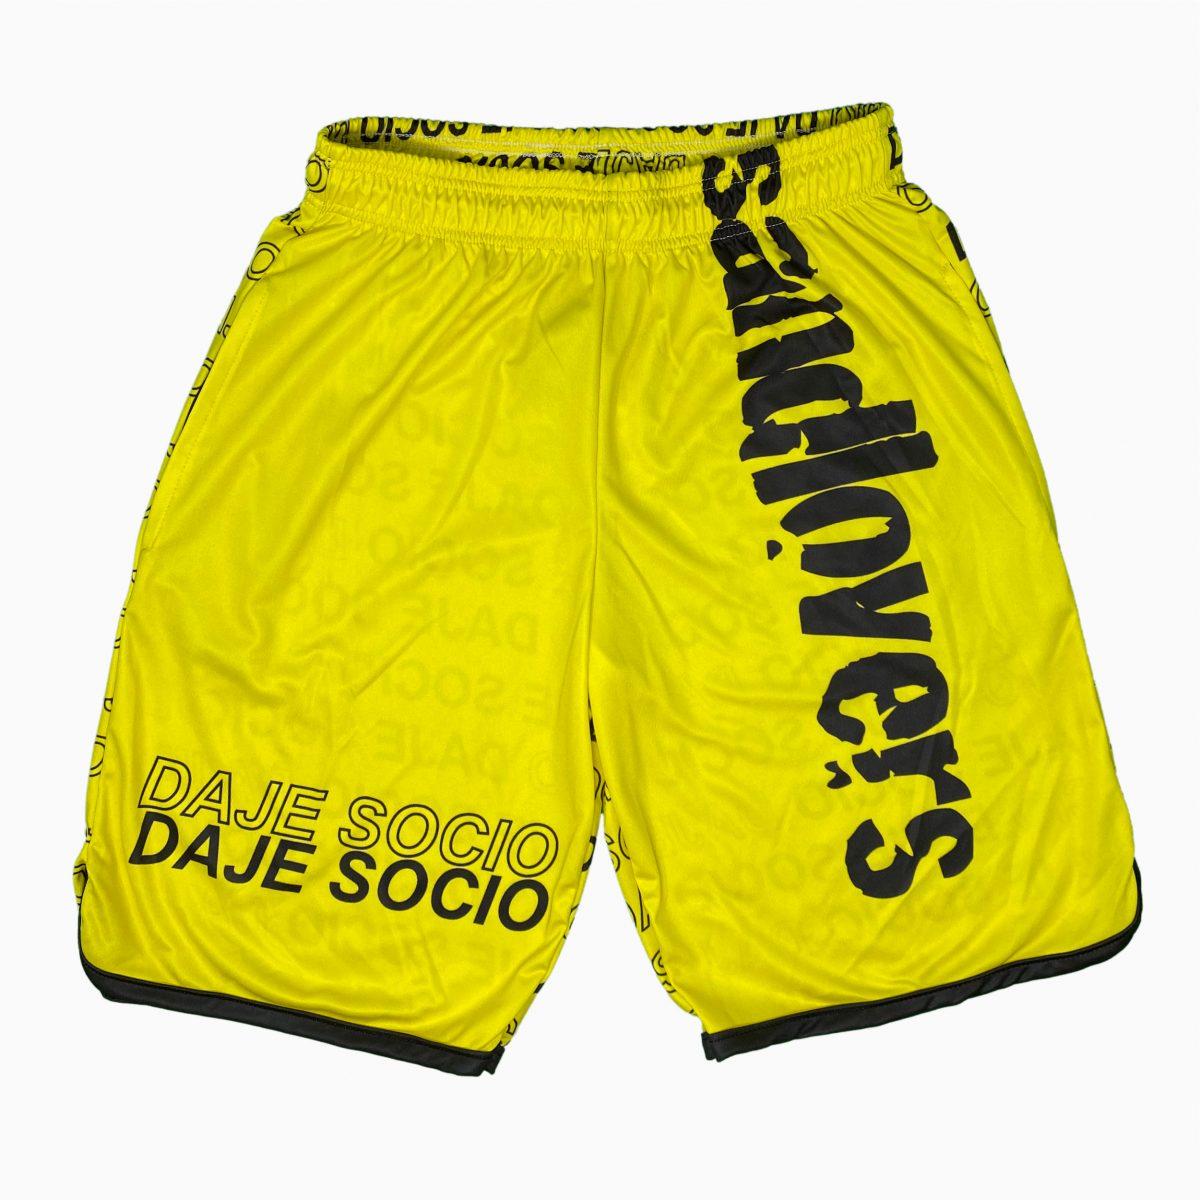 Pantaloncino Lettering – Daje Socio Giallo